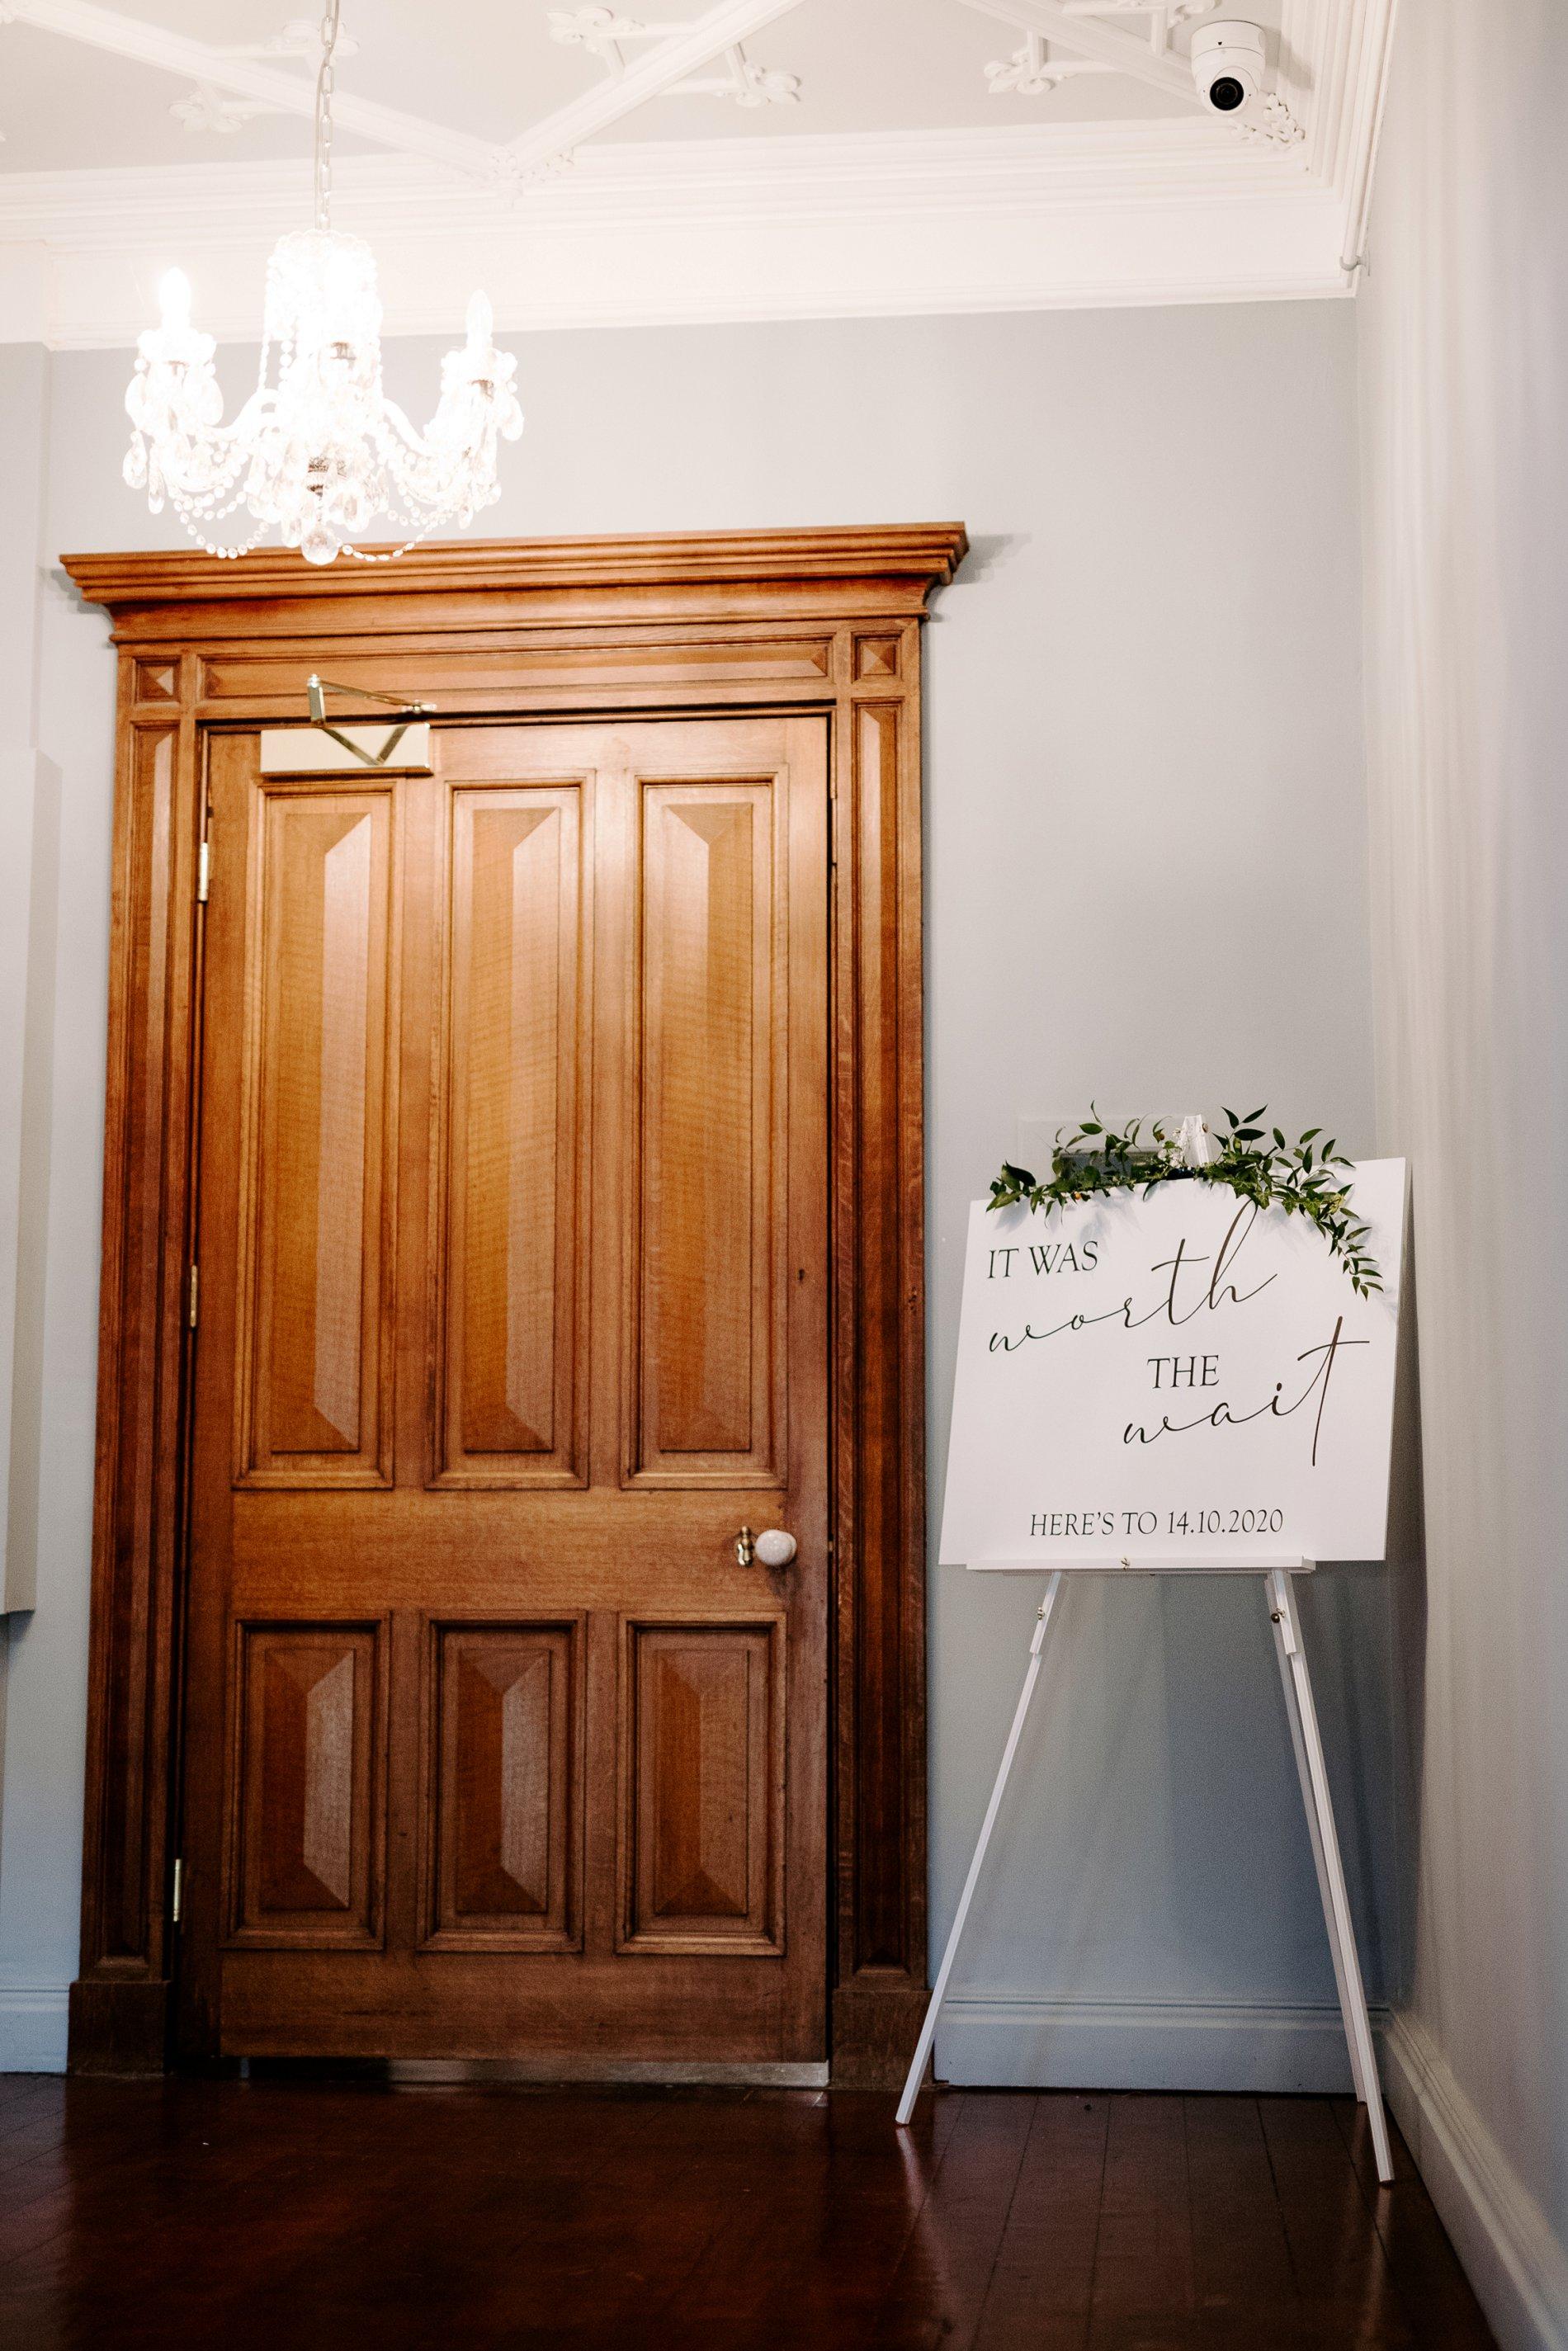 An Elegant White Wedding at Thicket Priory (c) Carla Whittingham Photography (3)